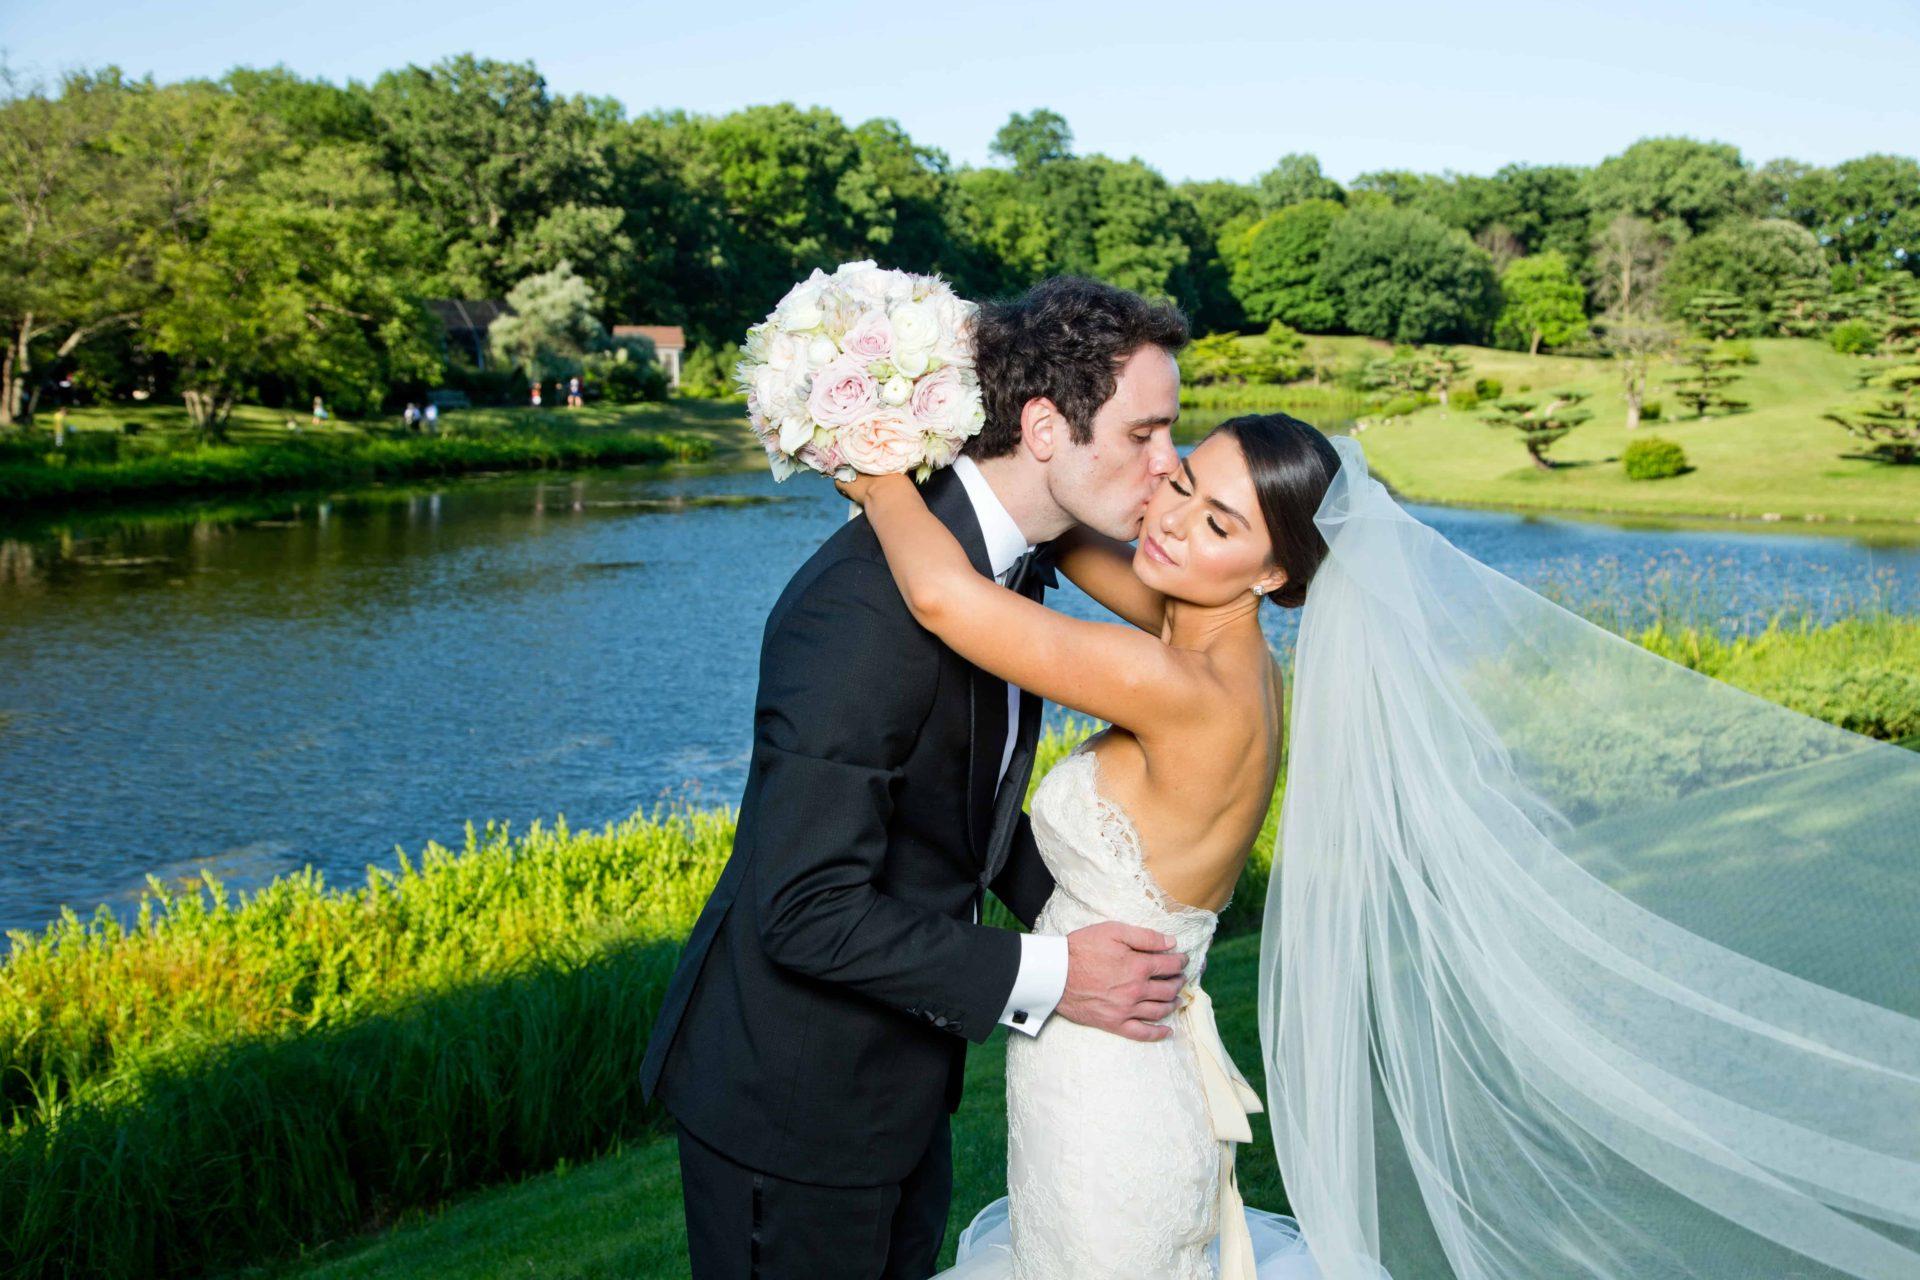 Summer wedding at Chicago Botanic Gardens